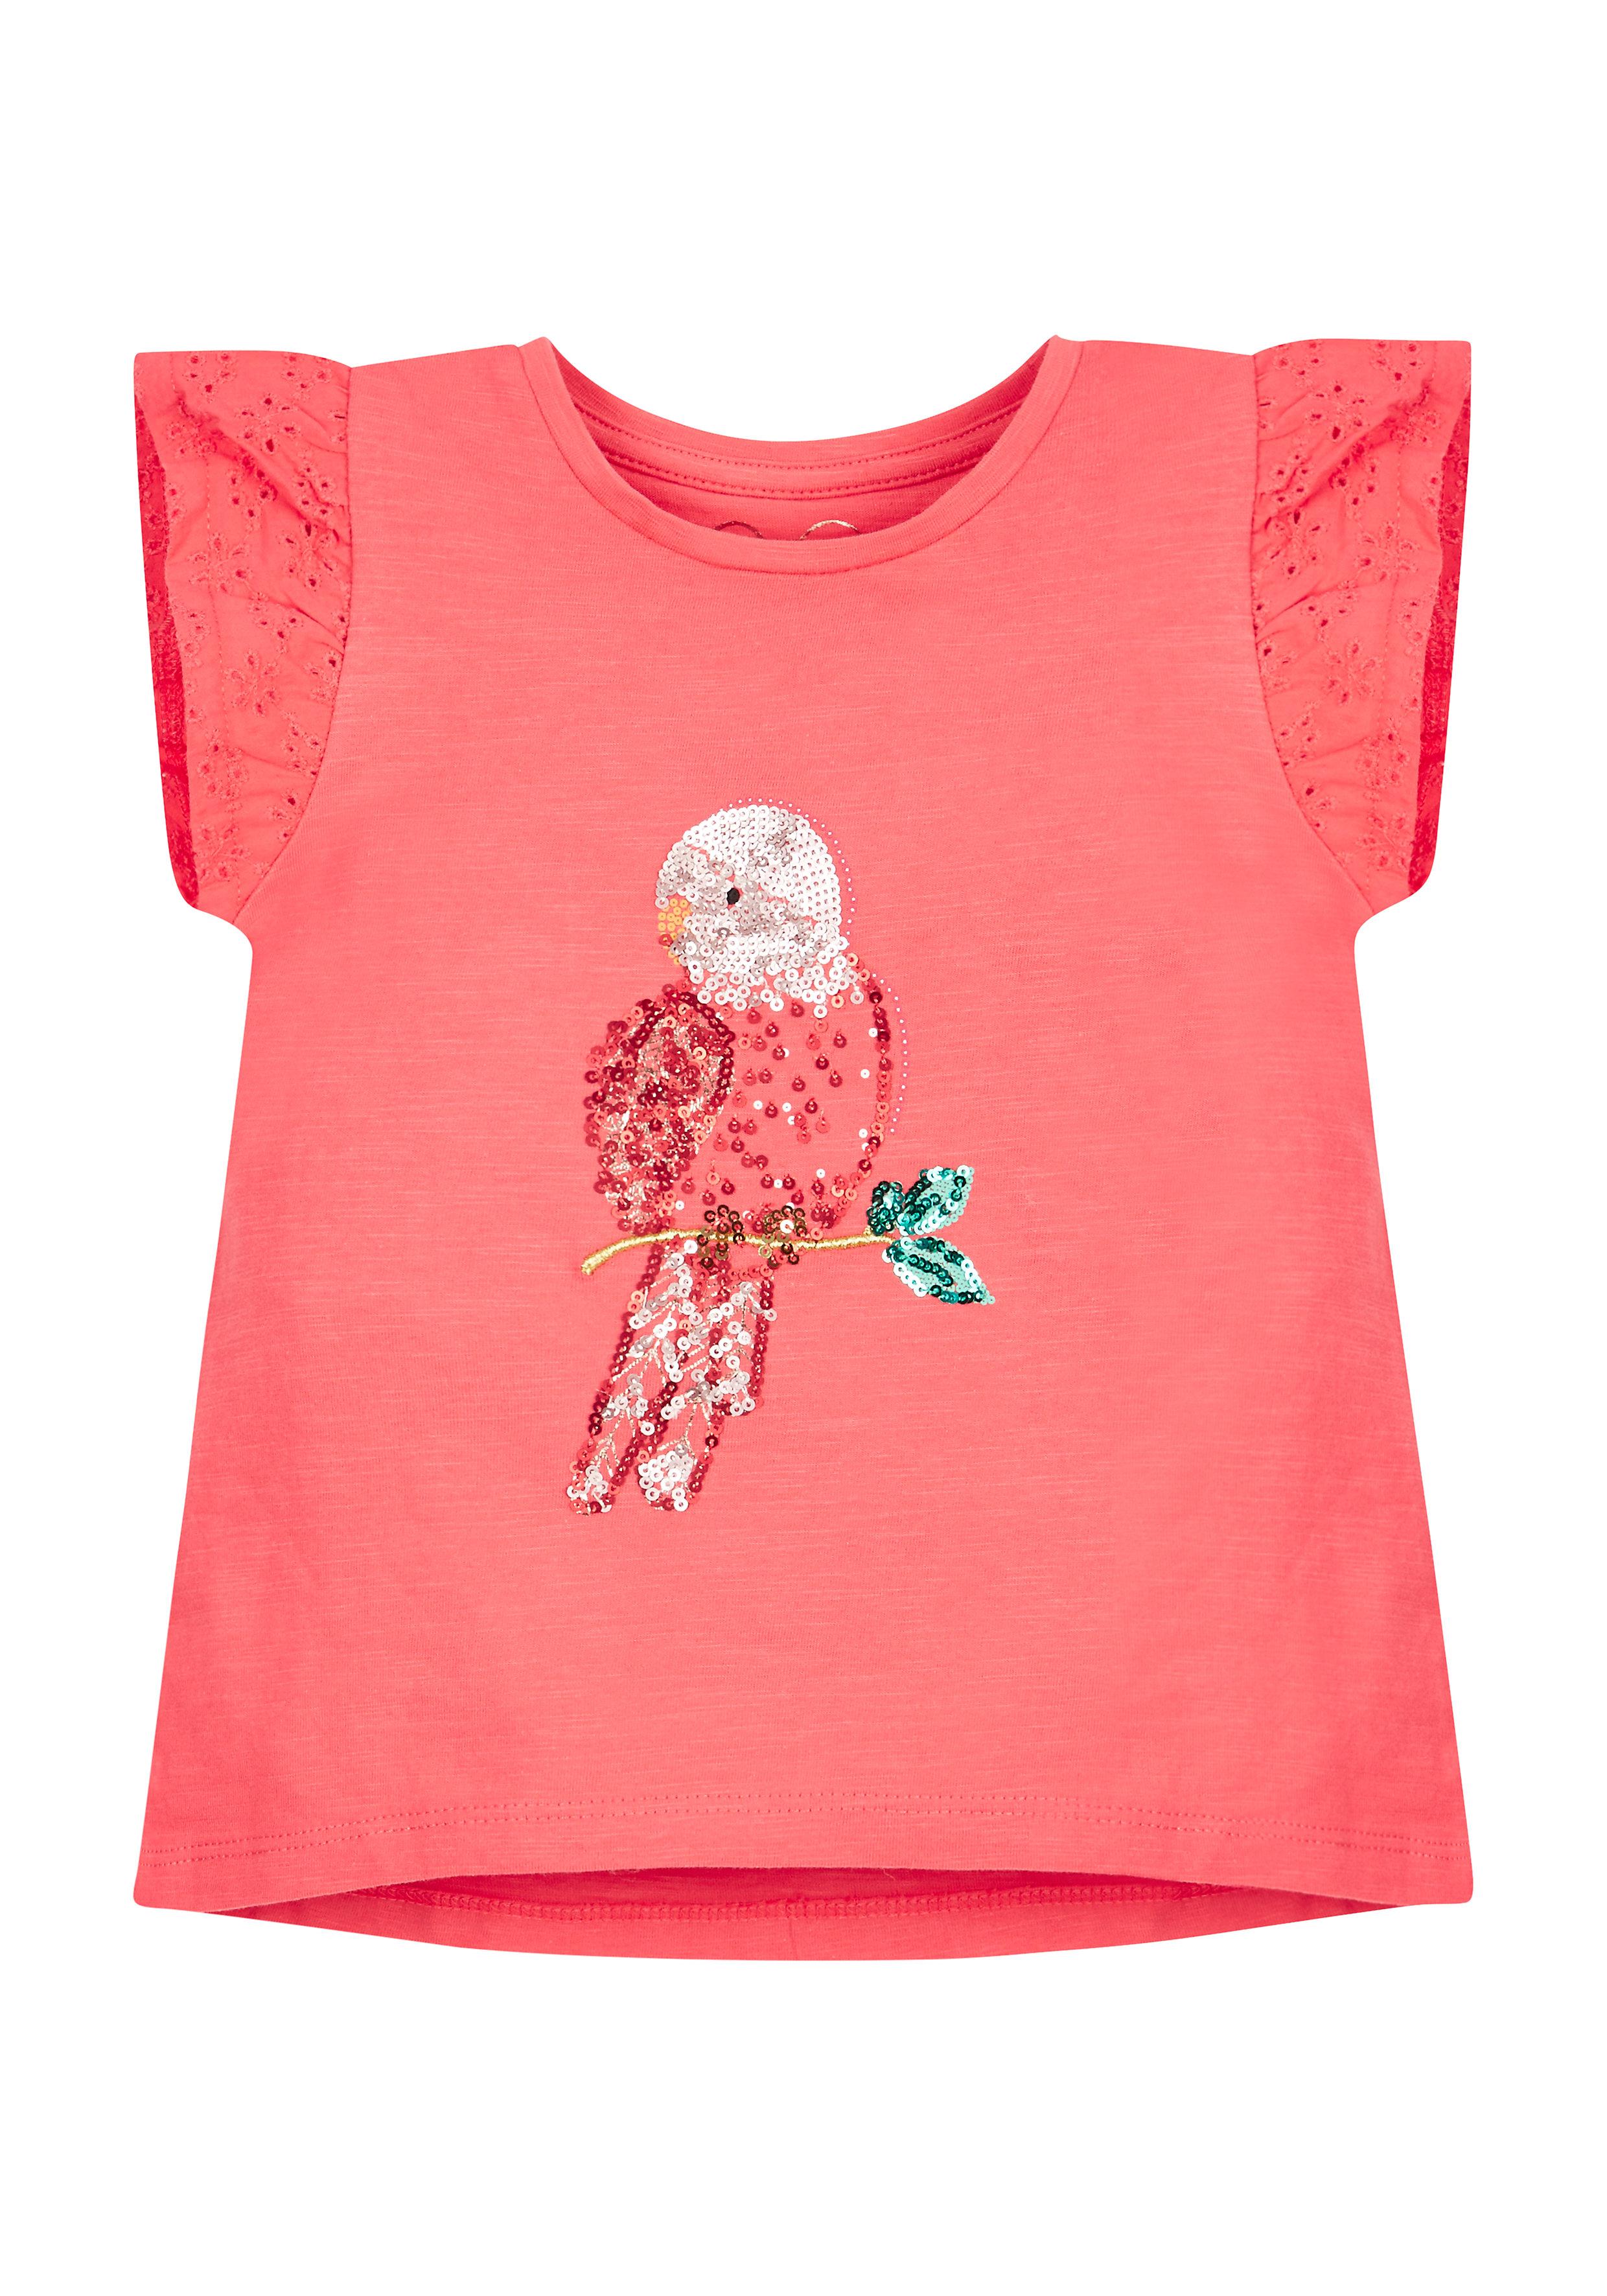 Mothercare | Girls Parrot Sequin Tee - Pink